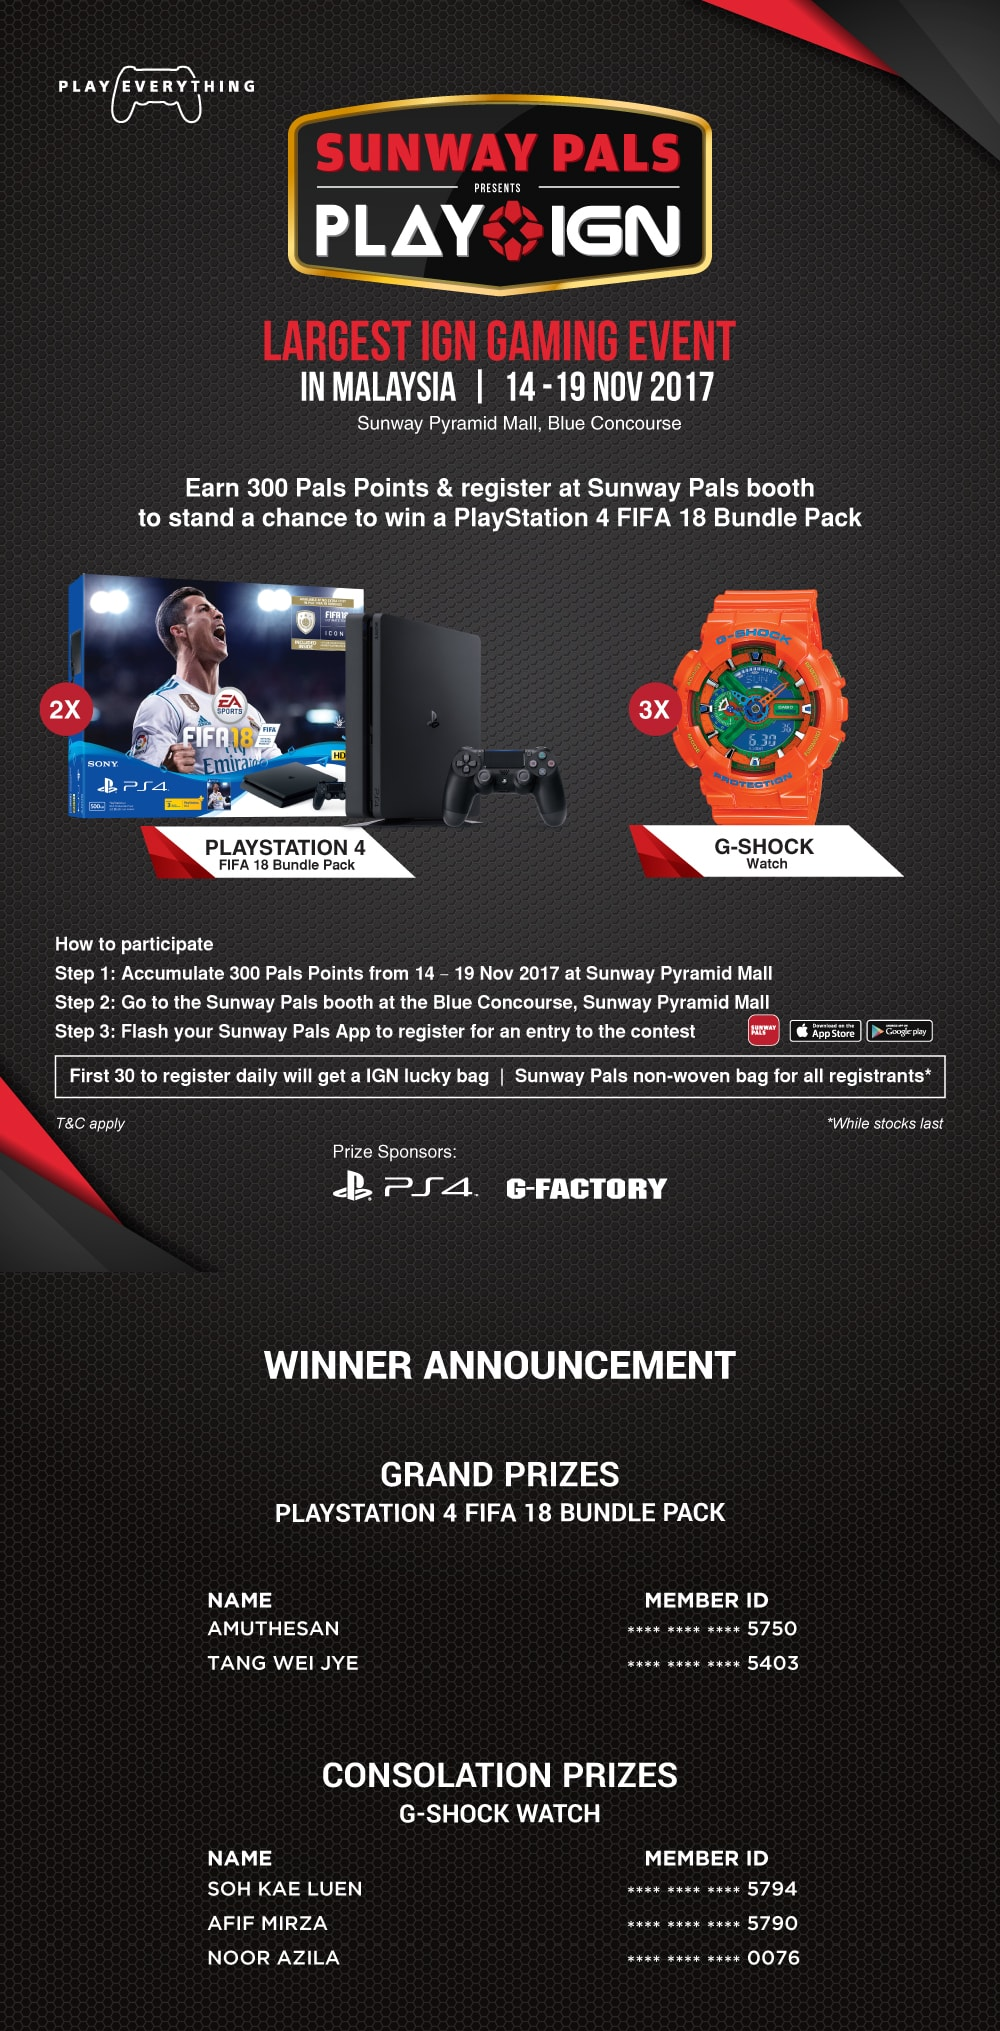 Sunway Pals IGN event